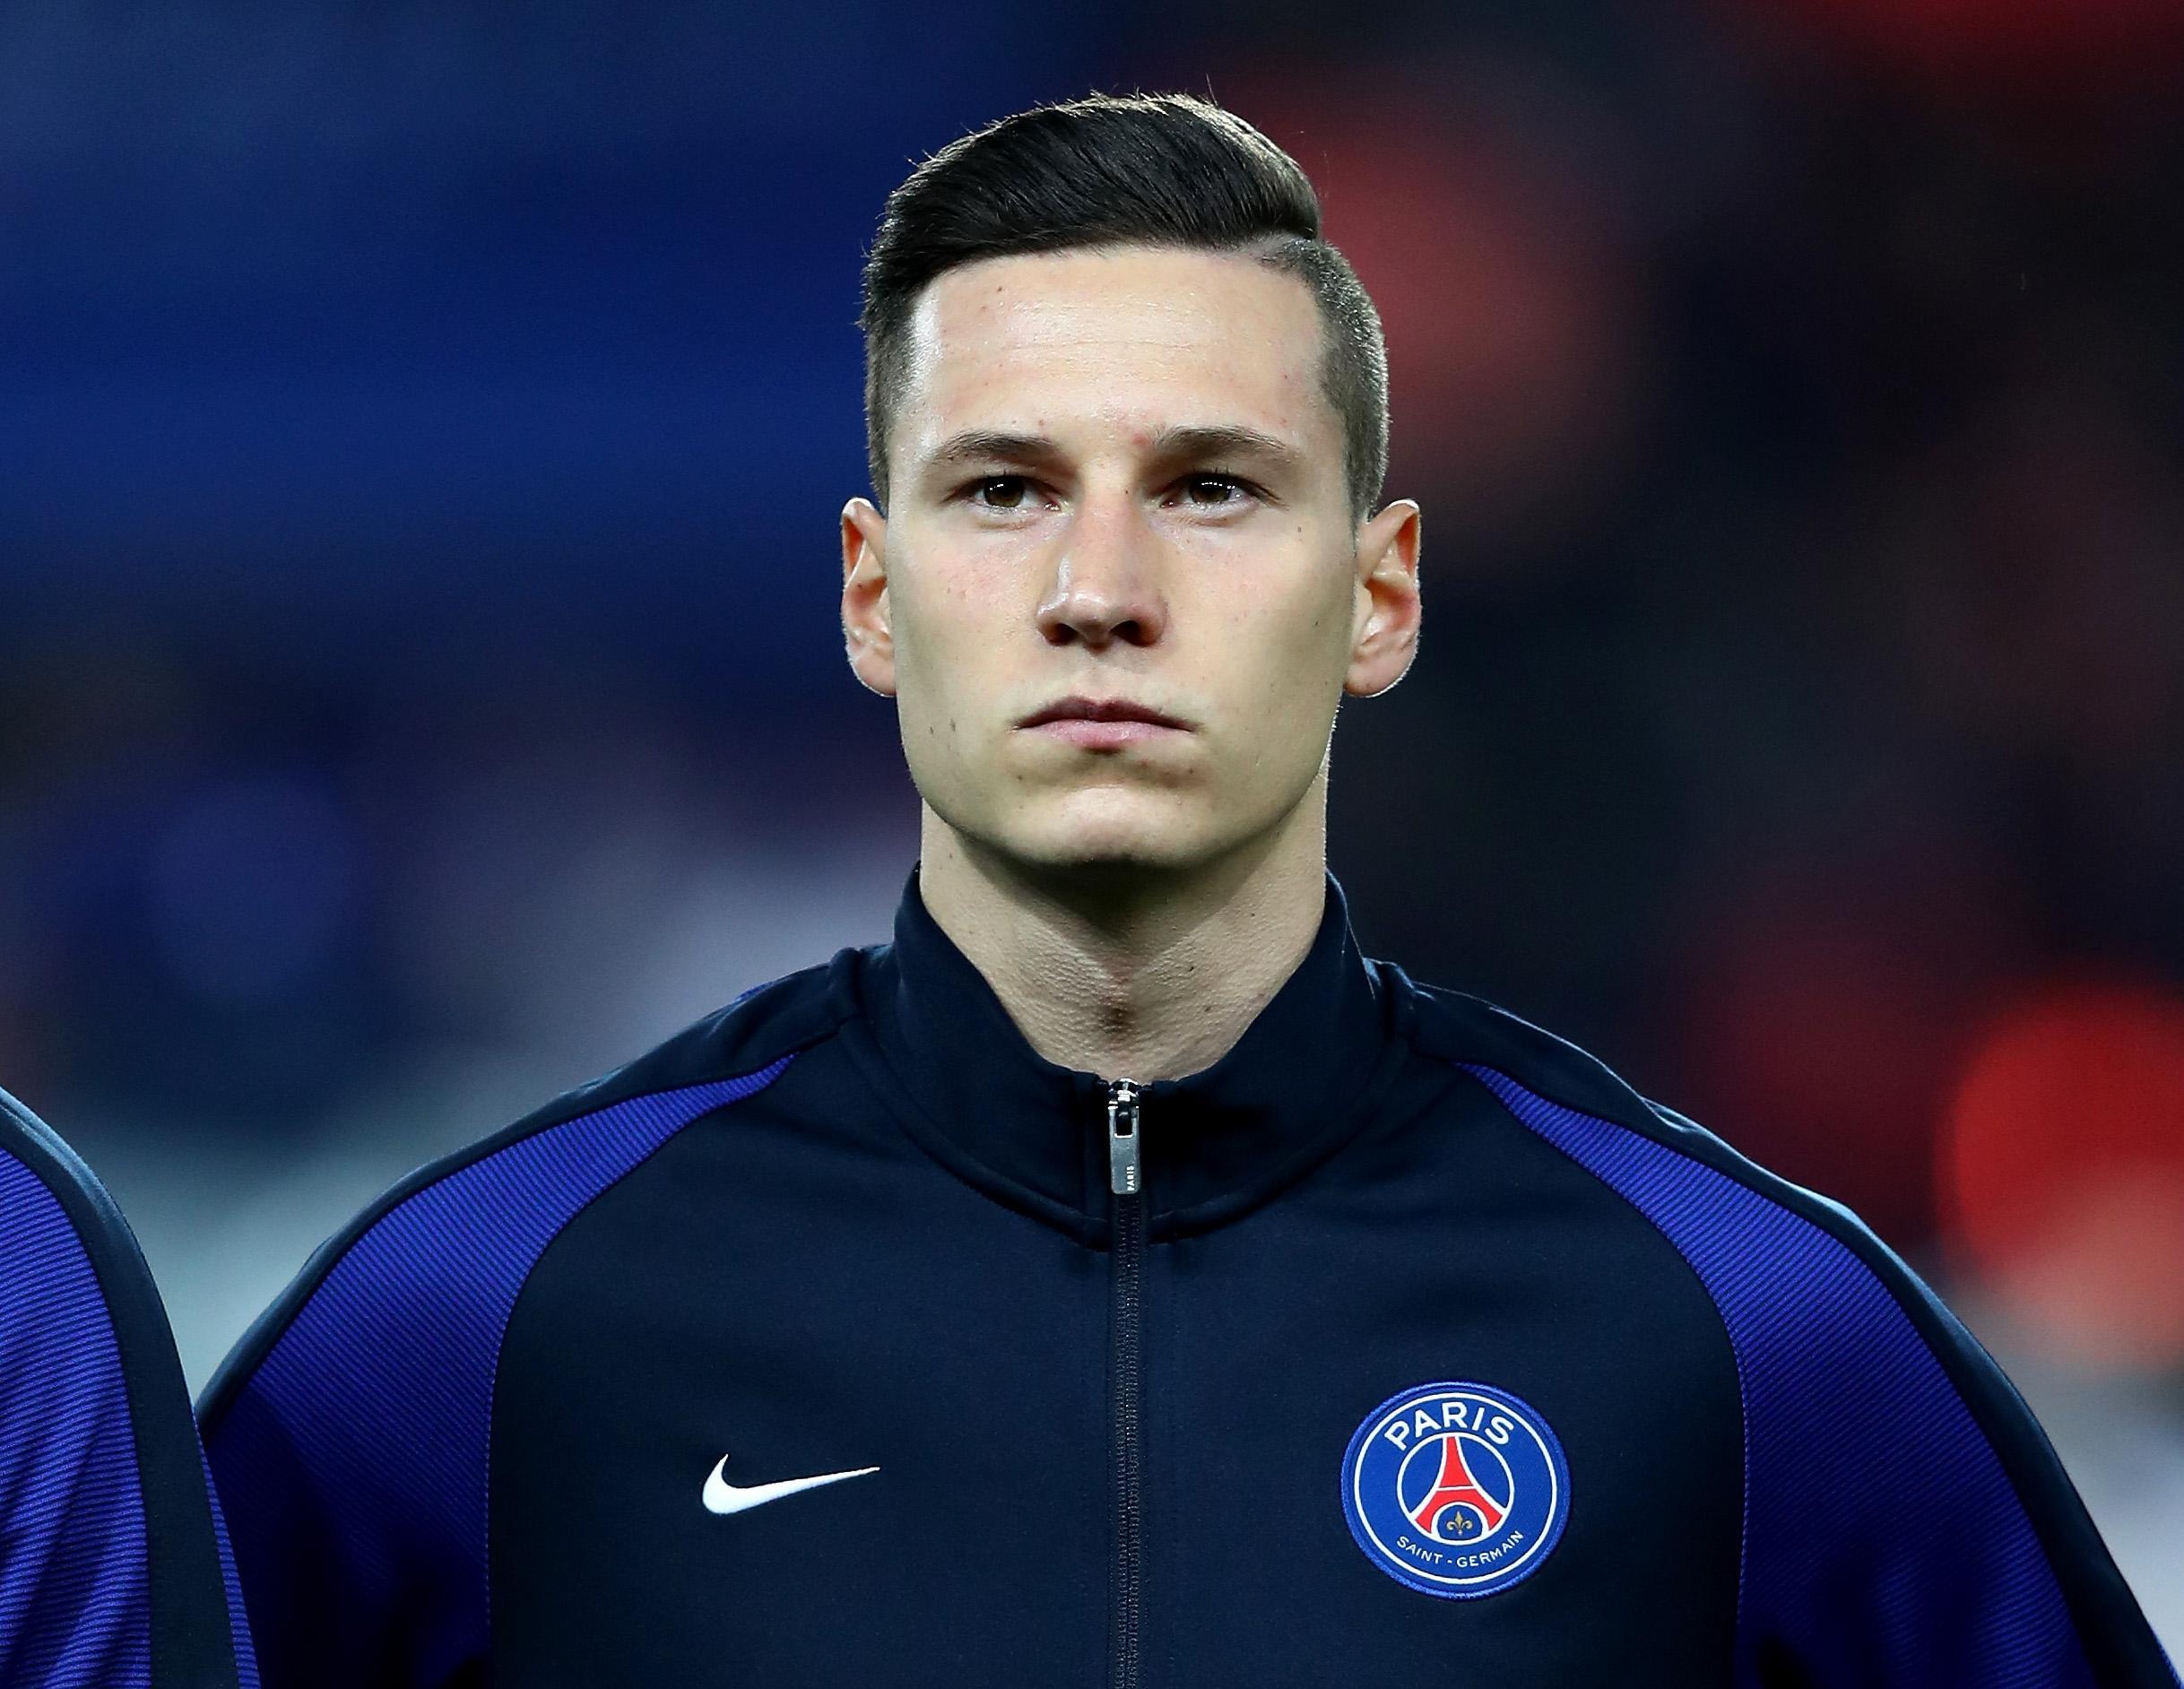 Julian Draxler Paris Saint-Germain Away Jersey